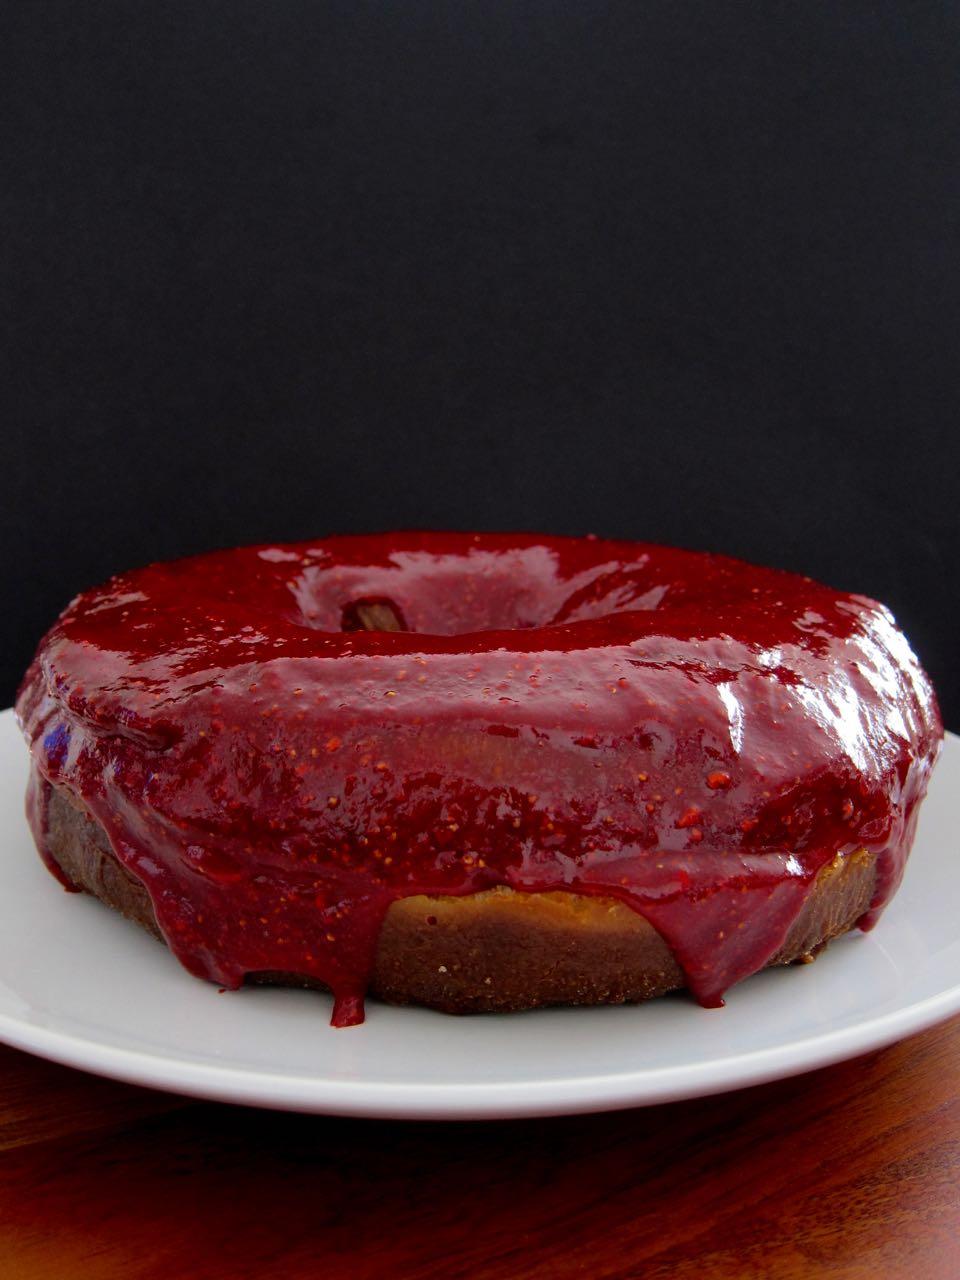 giant doughnut cake